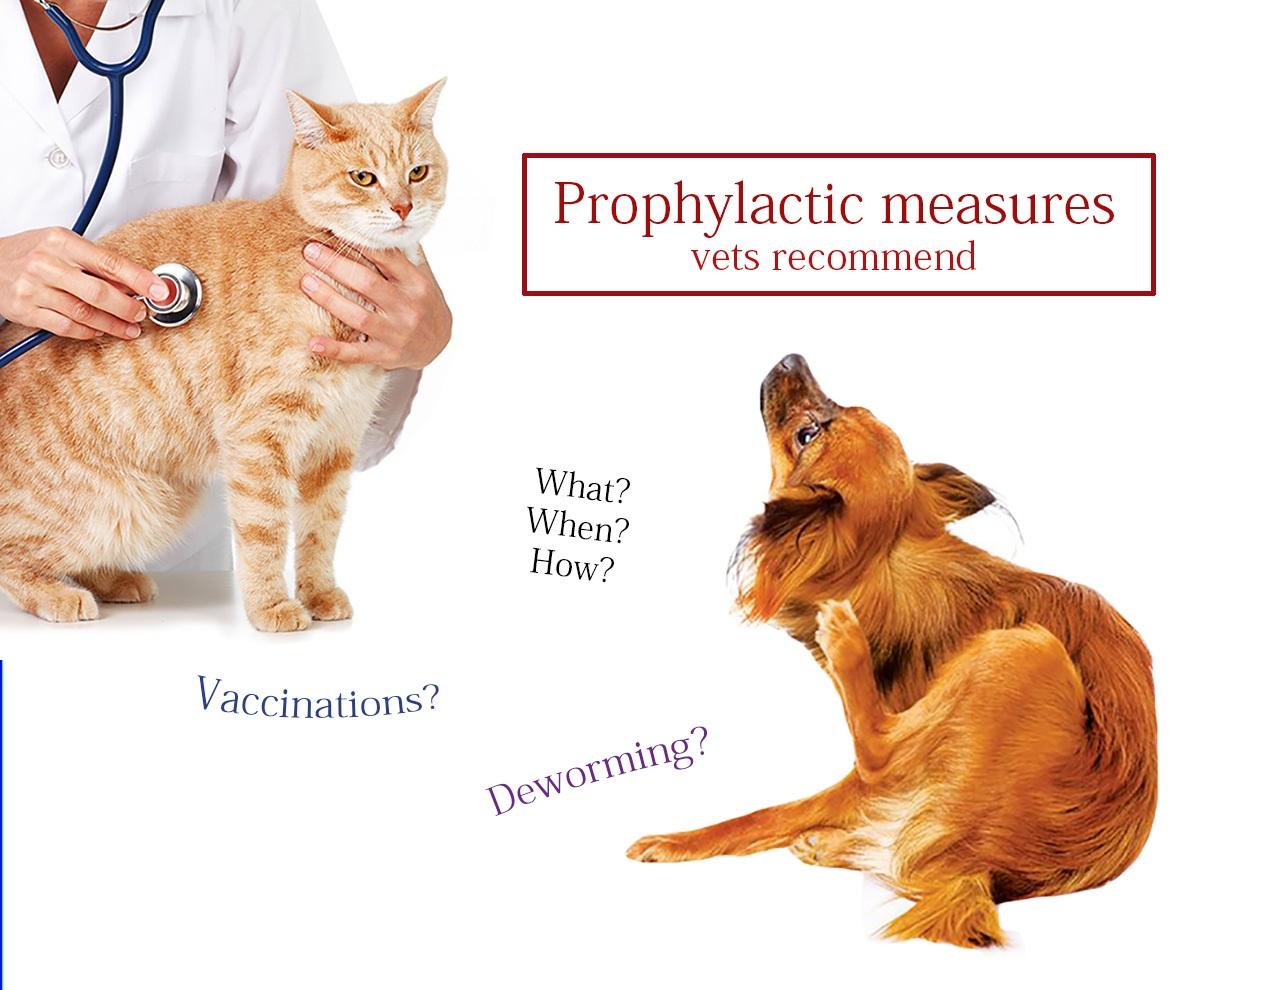 Prophylactic measures for pets